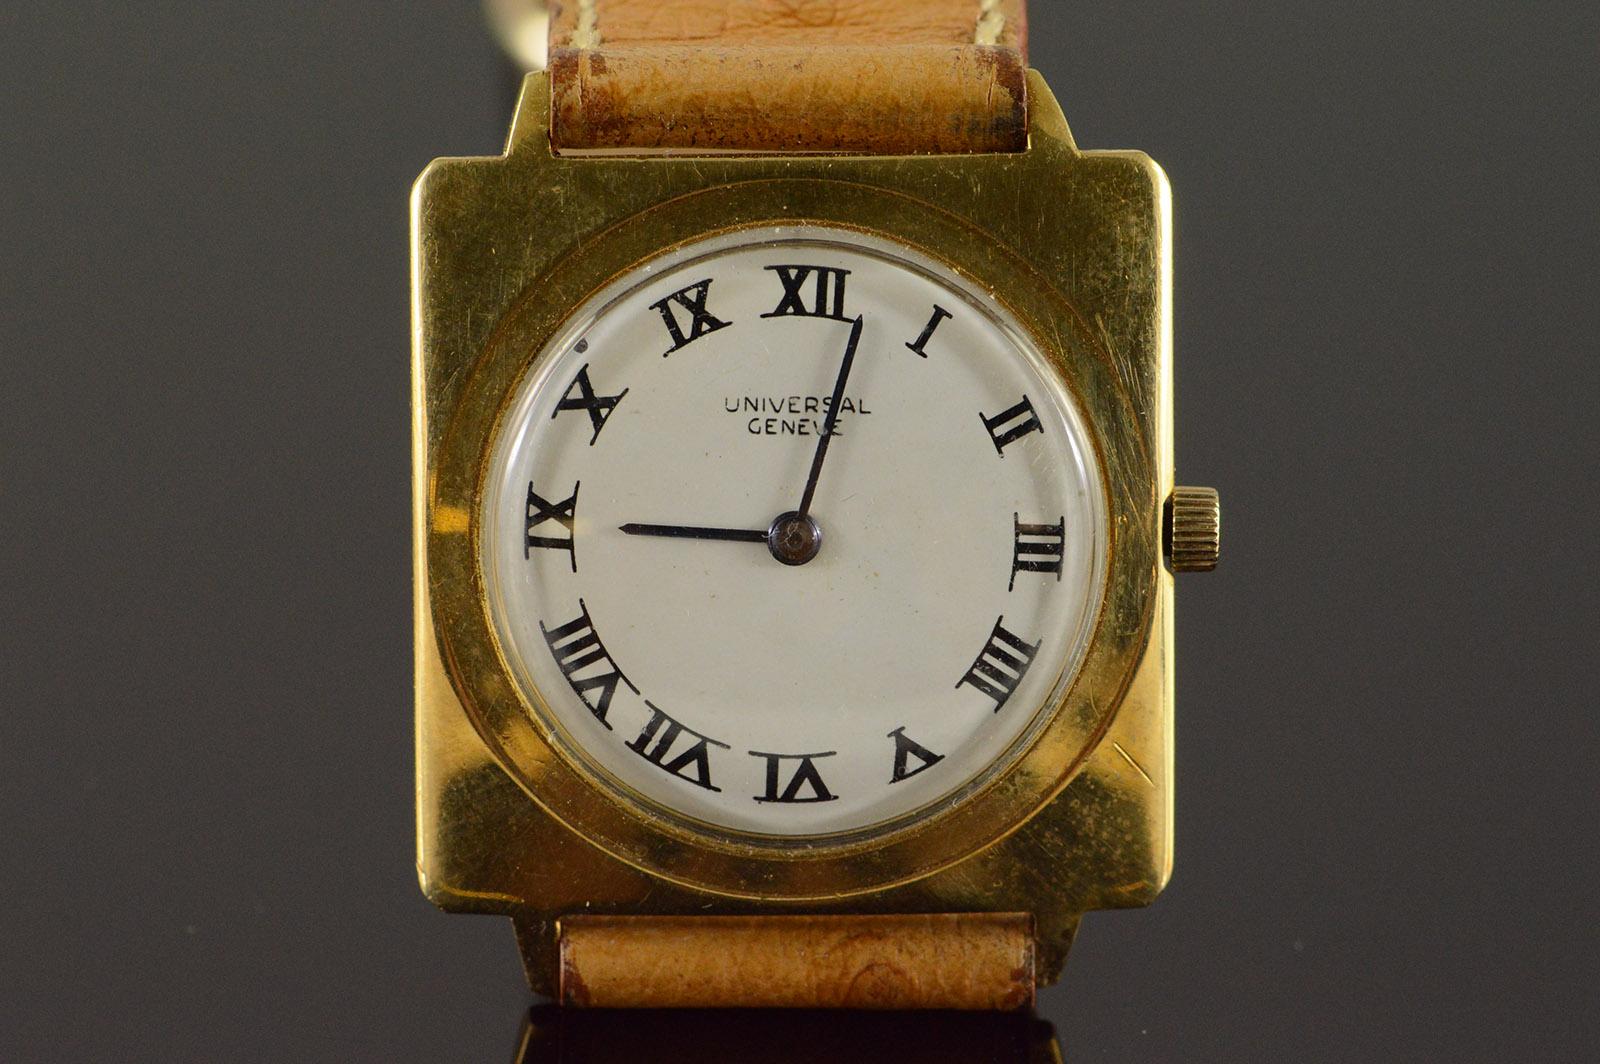 28mm Universal Geneve Classic Roman Numeral Watch - Women's